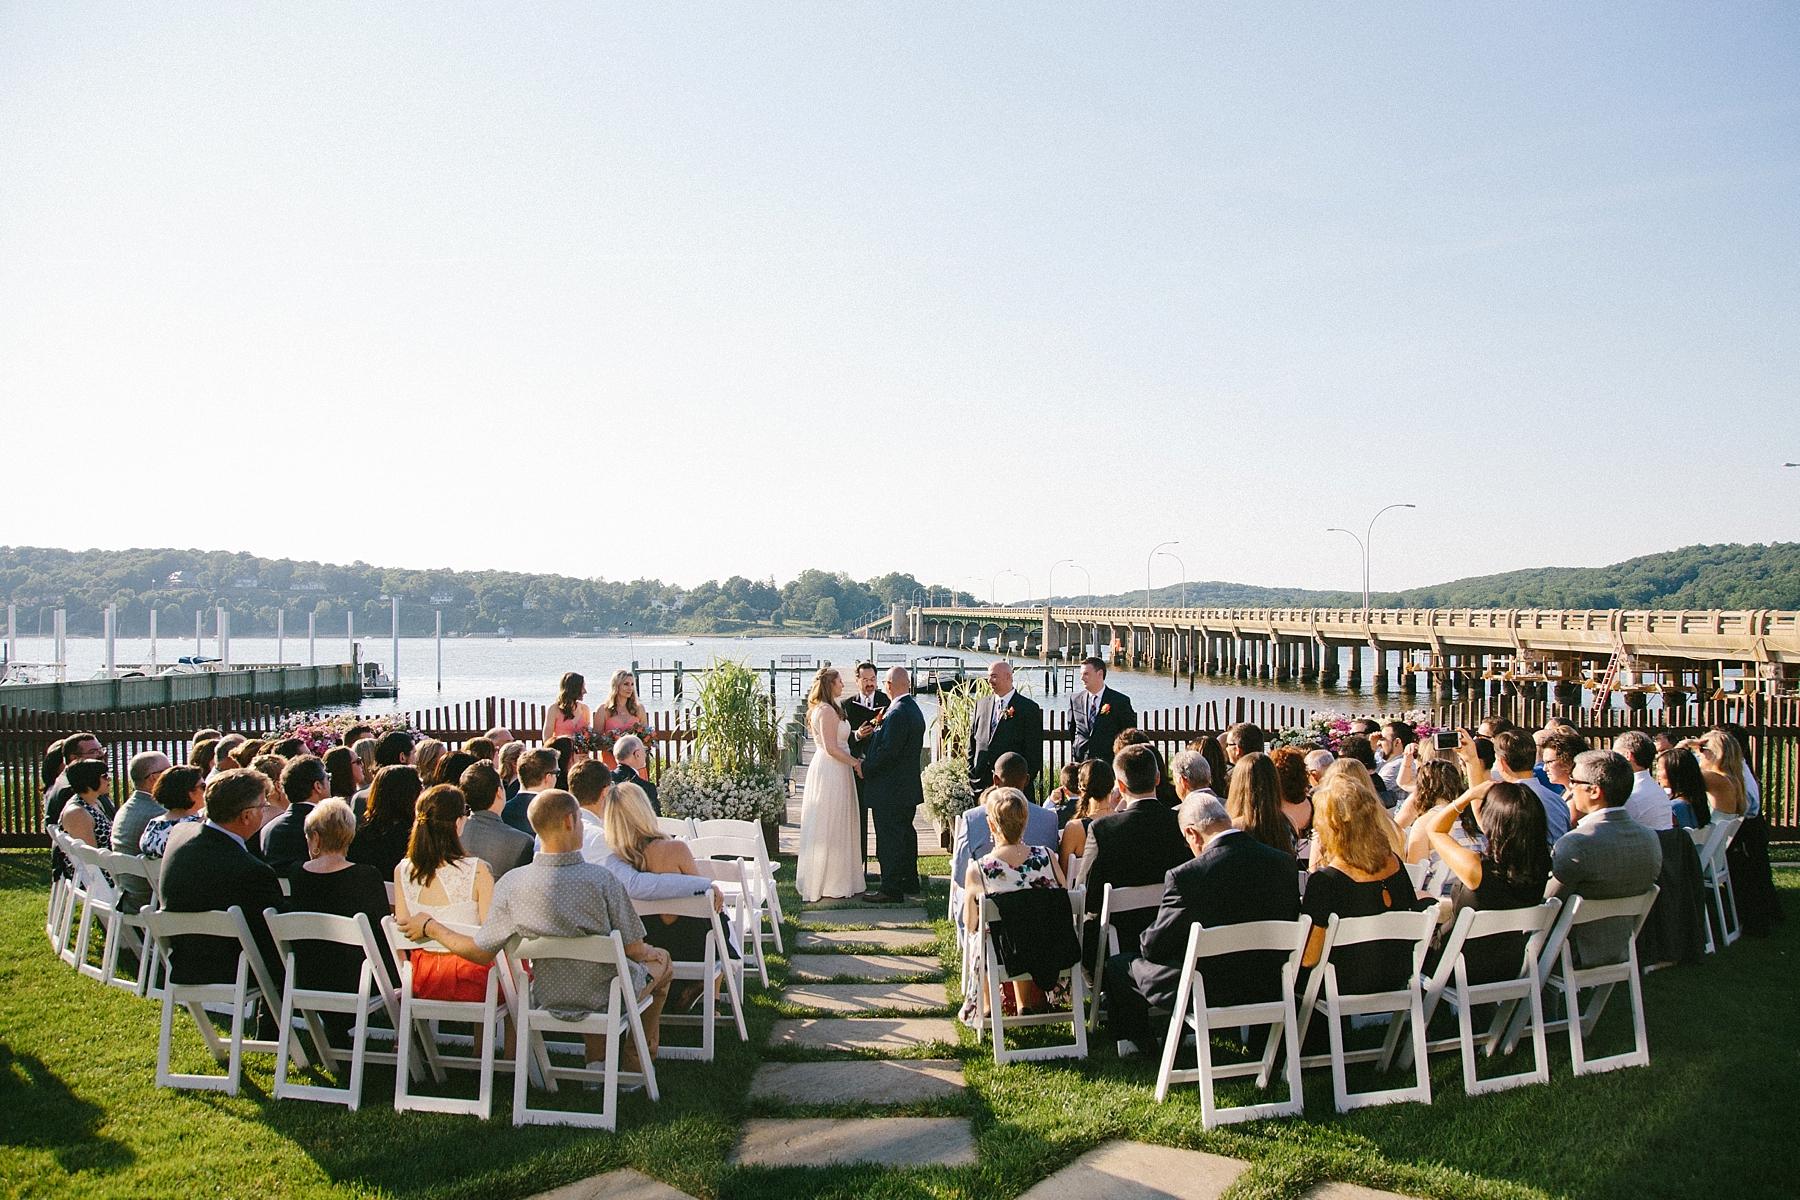 asbury-park-nj-wedding-salt-creek-grill_0019.jpg